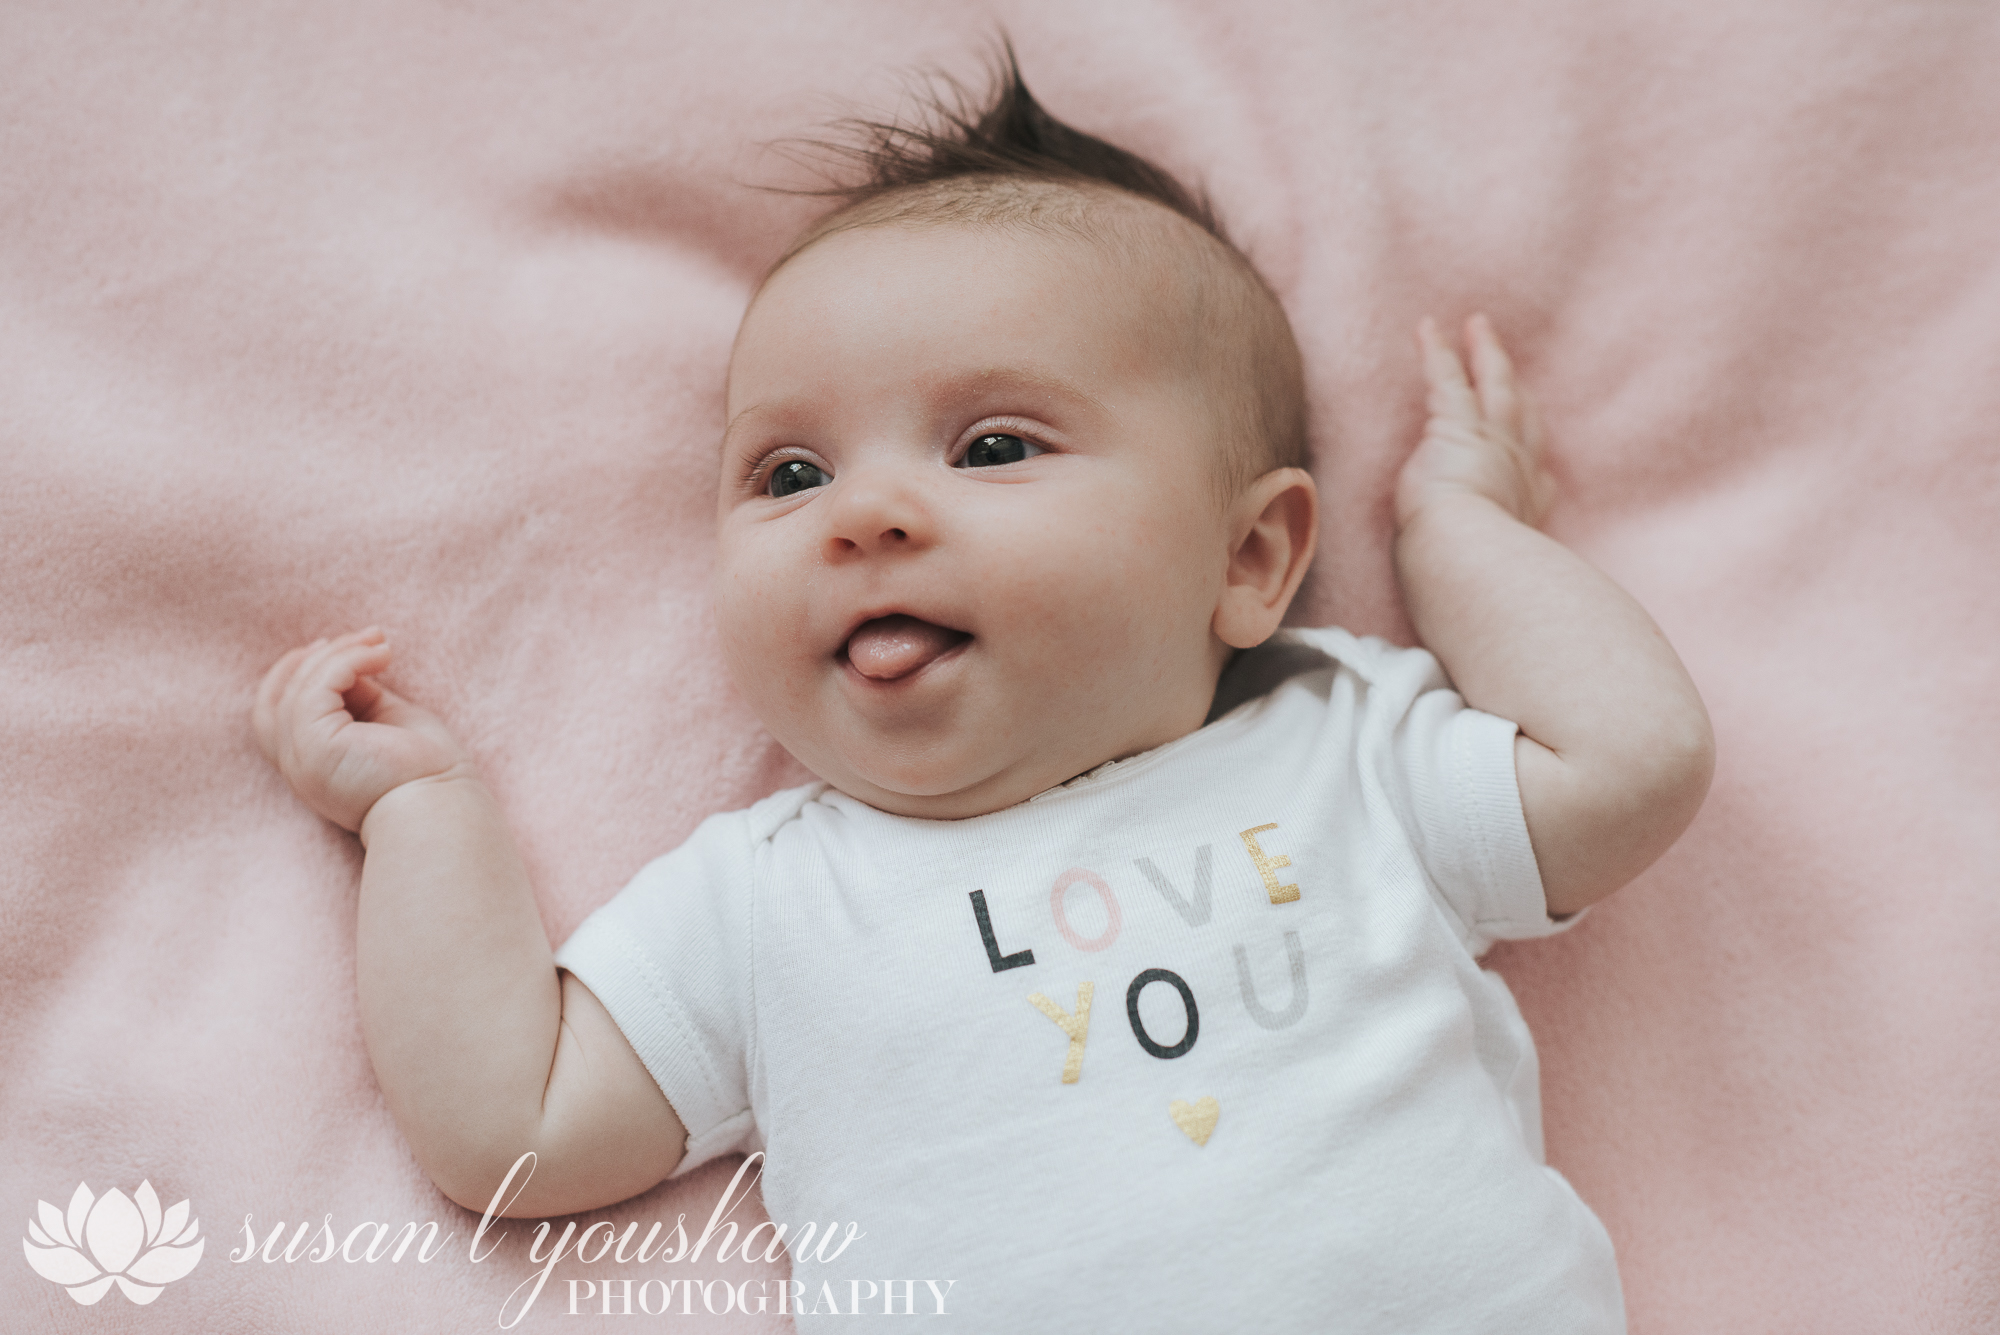 BLOG The Deao Family 06-29-2018 SLY Photography LLC-27.jpg